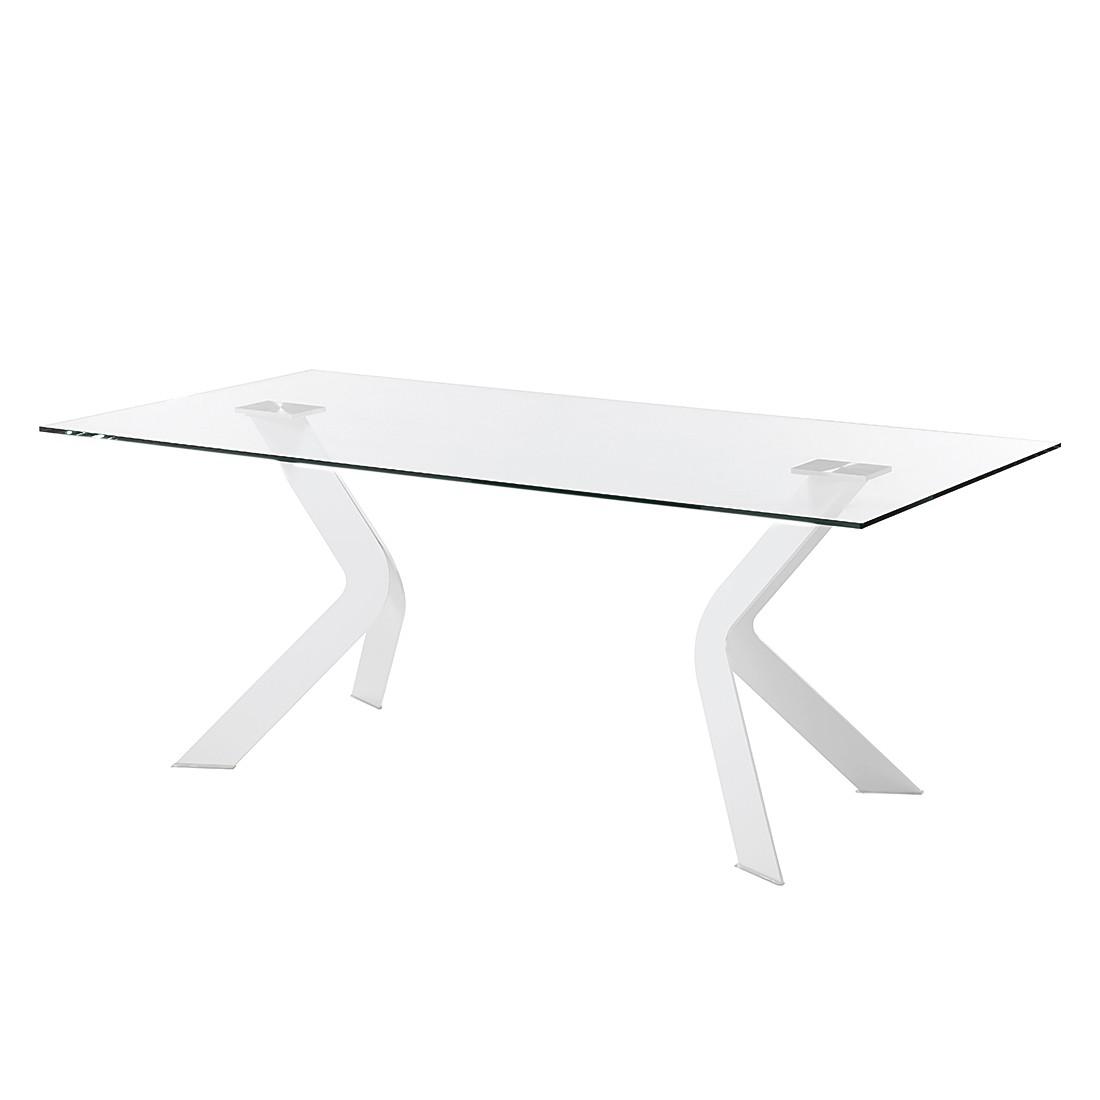 Eettafel Sarinna - glas/roestvrij staal - Helder glas/wit - 200x100cm, roomscape